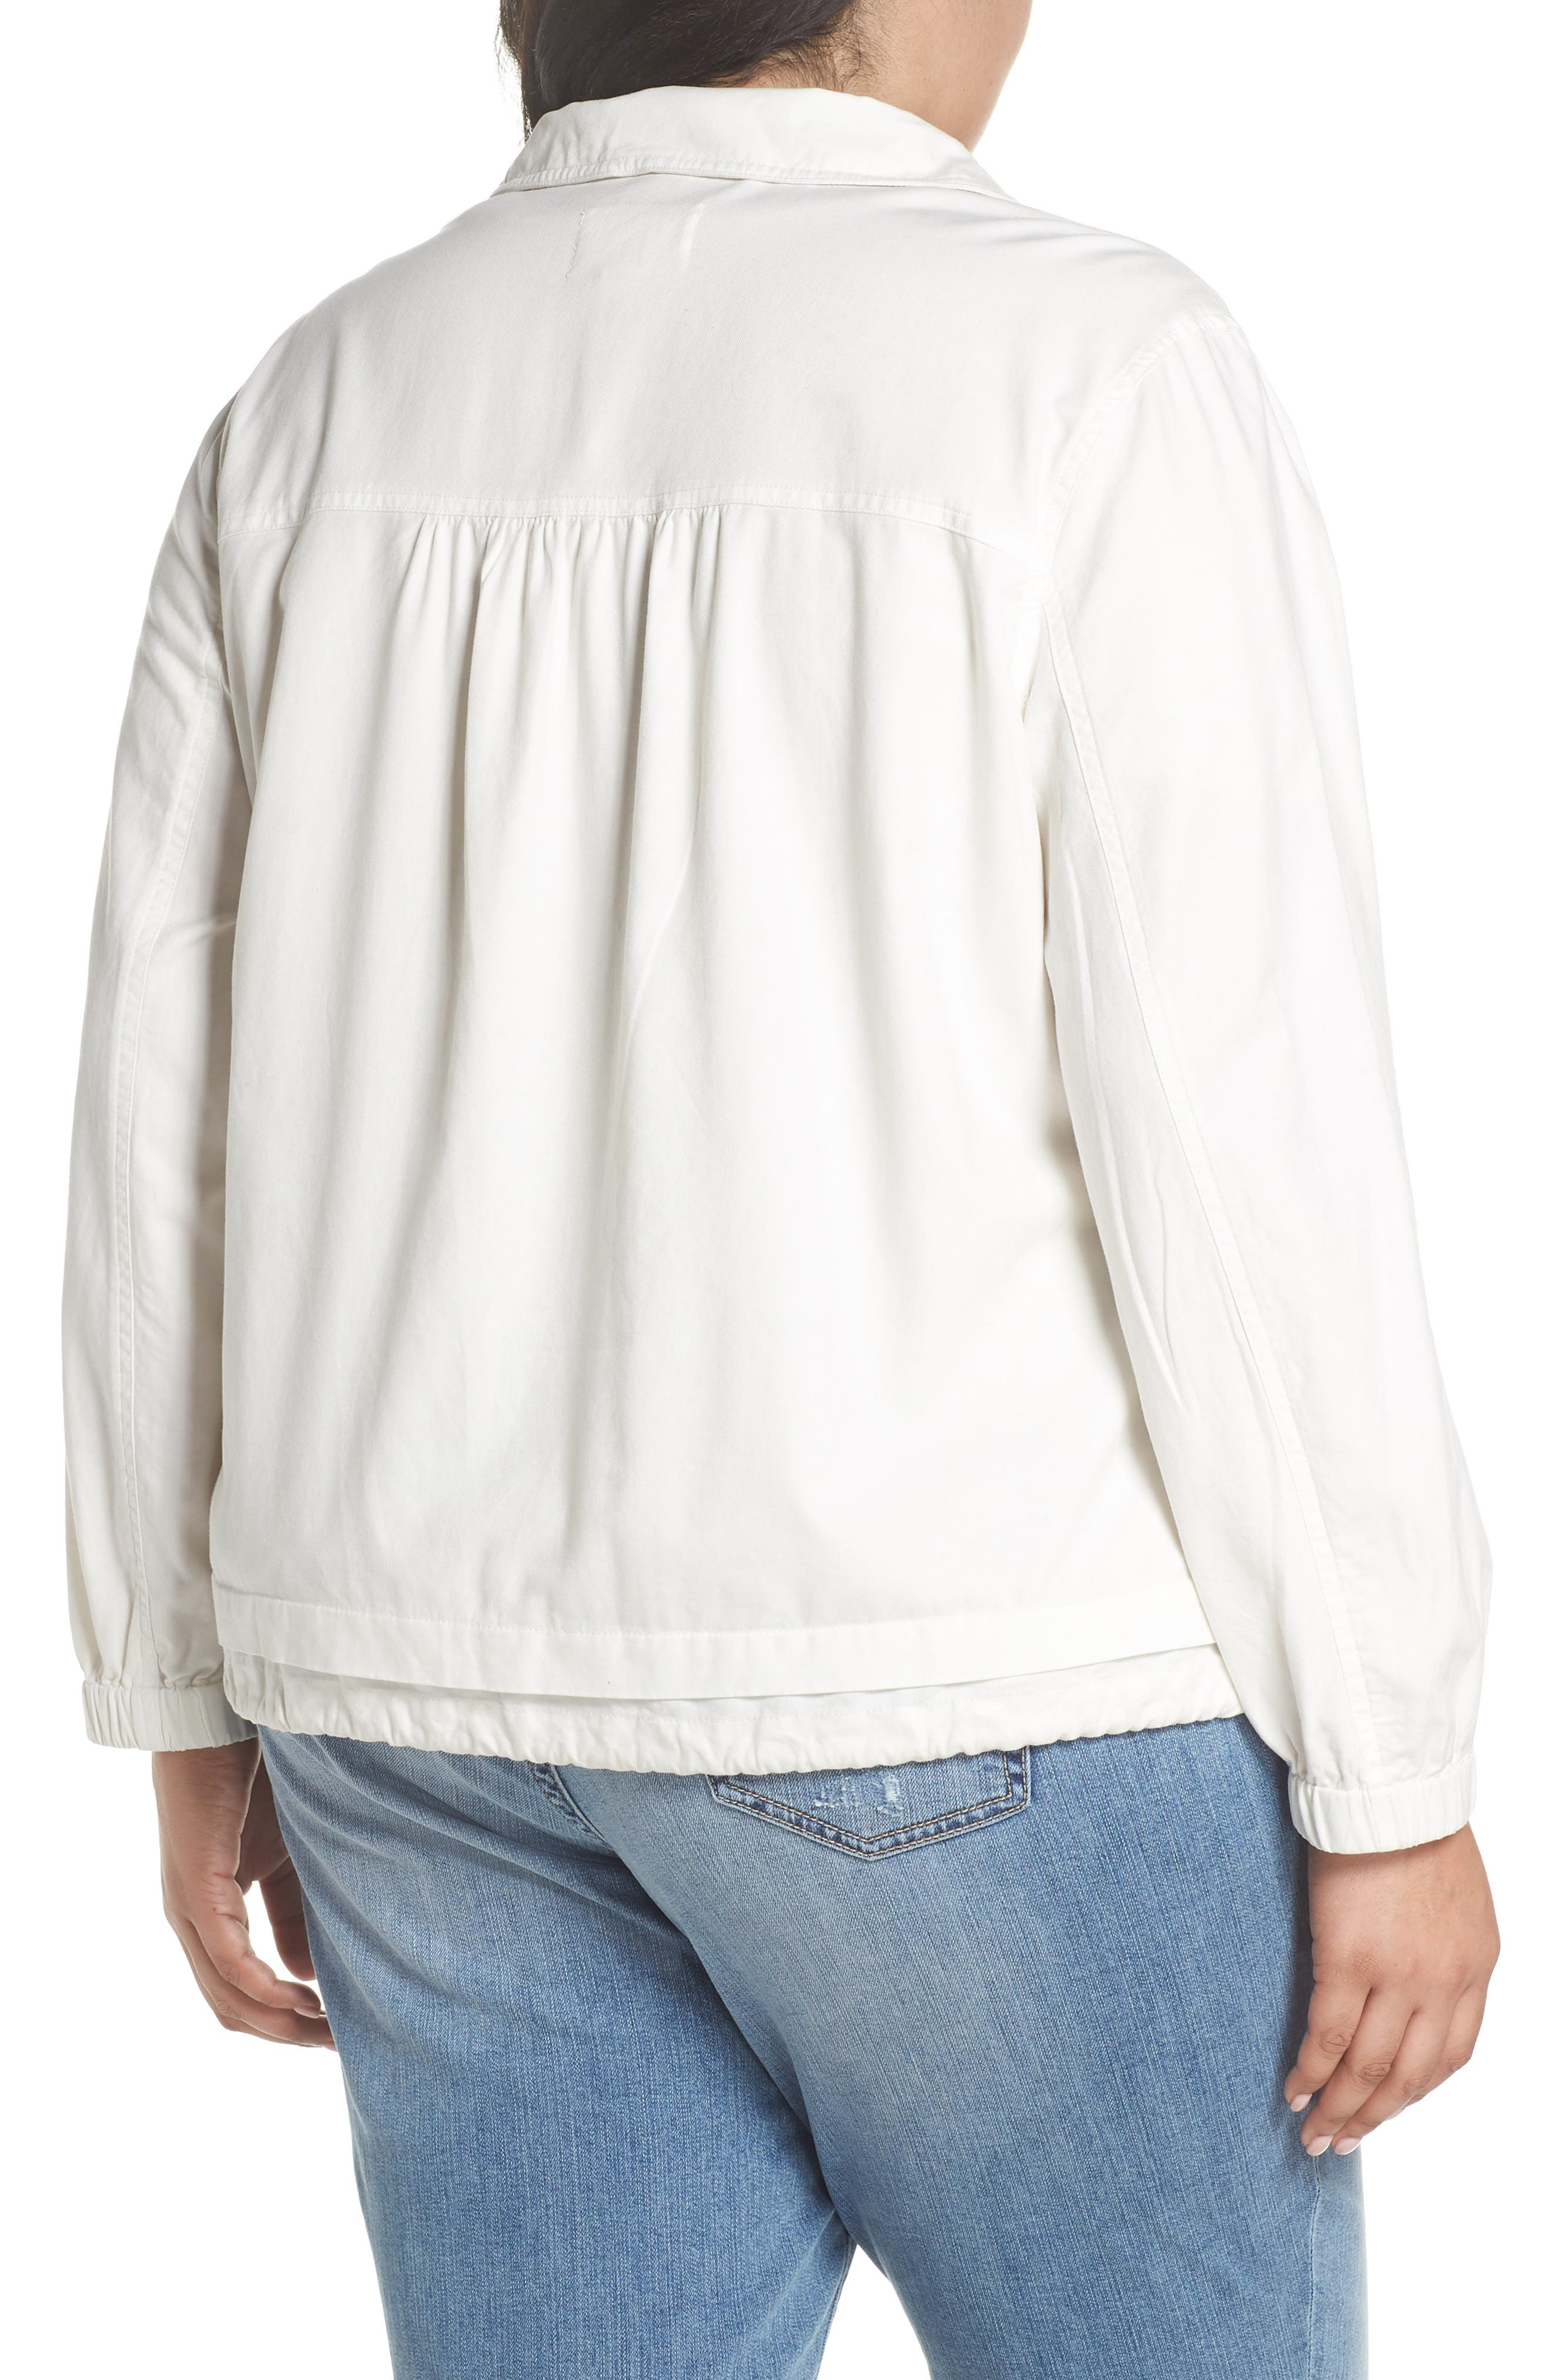 Snap Pocket Utility Jacket,                             Alternate thumbnail 2, color,                             WHITE SNOW